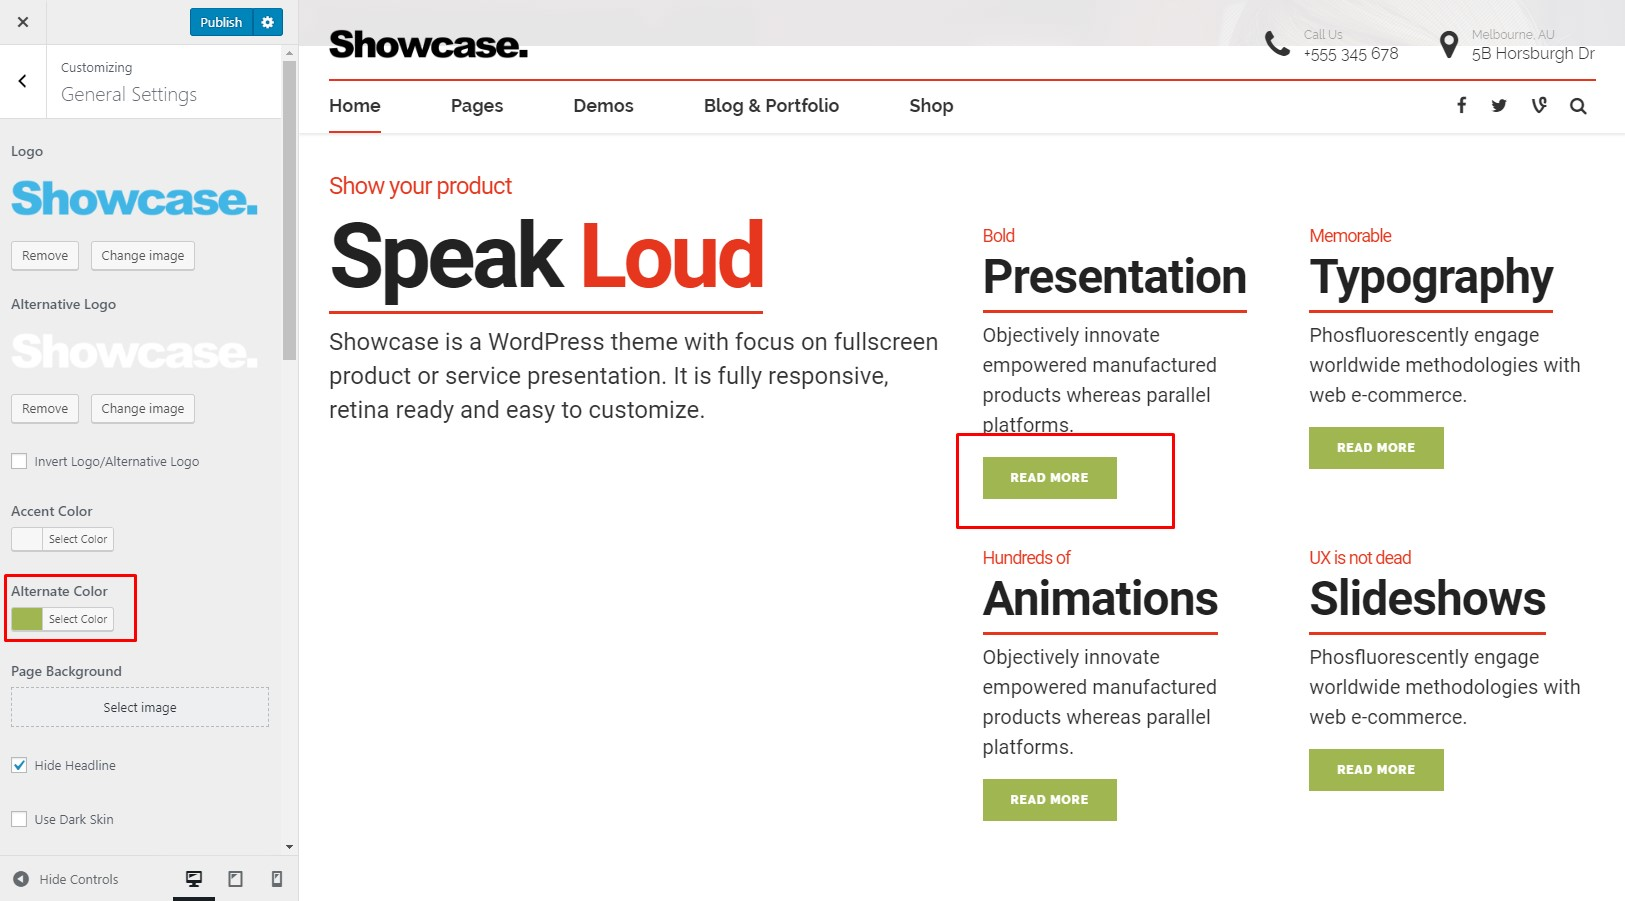 https://documentation.bold-themes.com/showcase/wp-content/uploads/sites/46/2019/09/alt-color.jpg